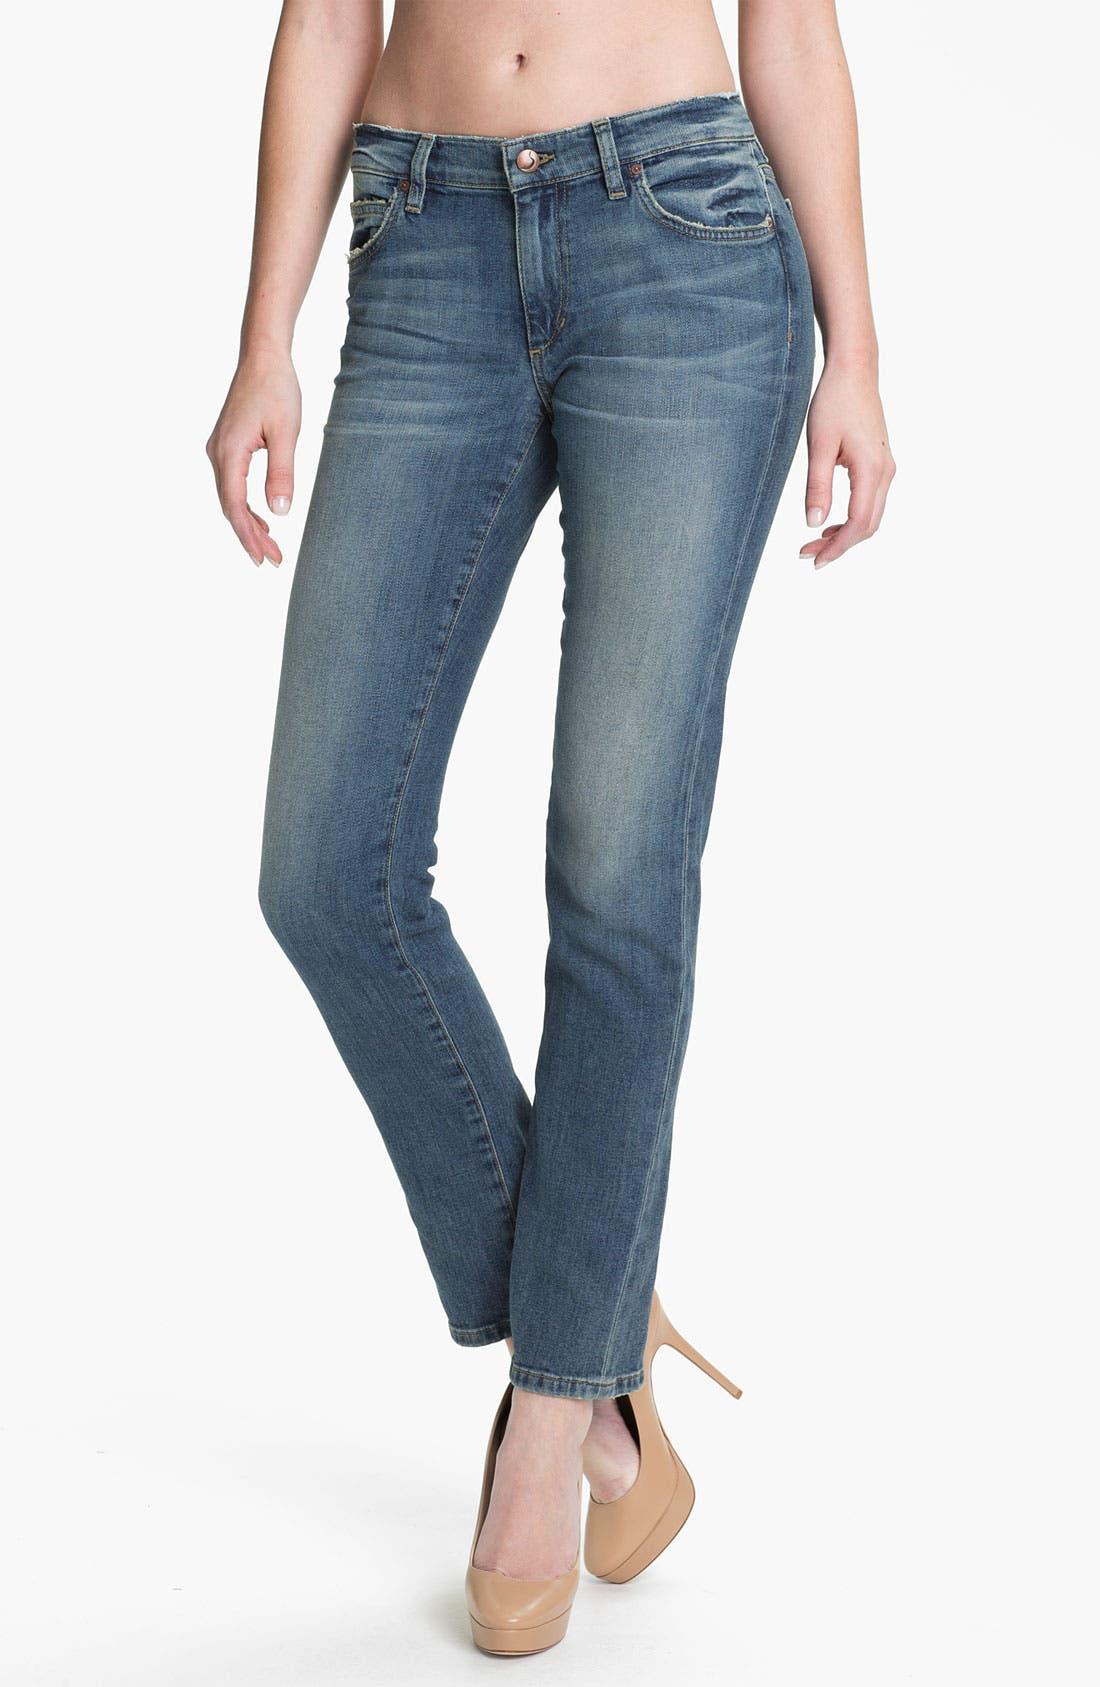 Main Image - Joe's 'Easy Slim' Vintage Wash Jeans (Tess)